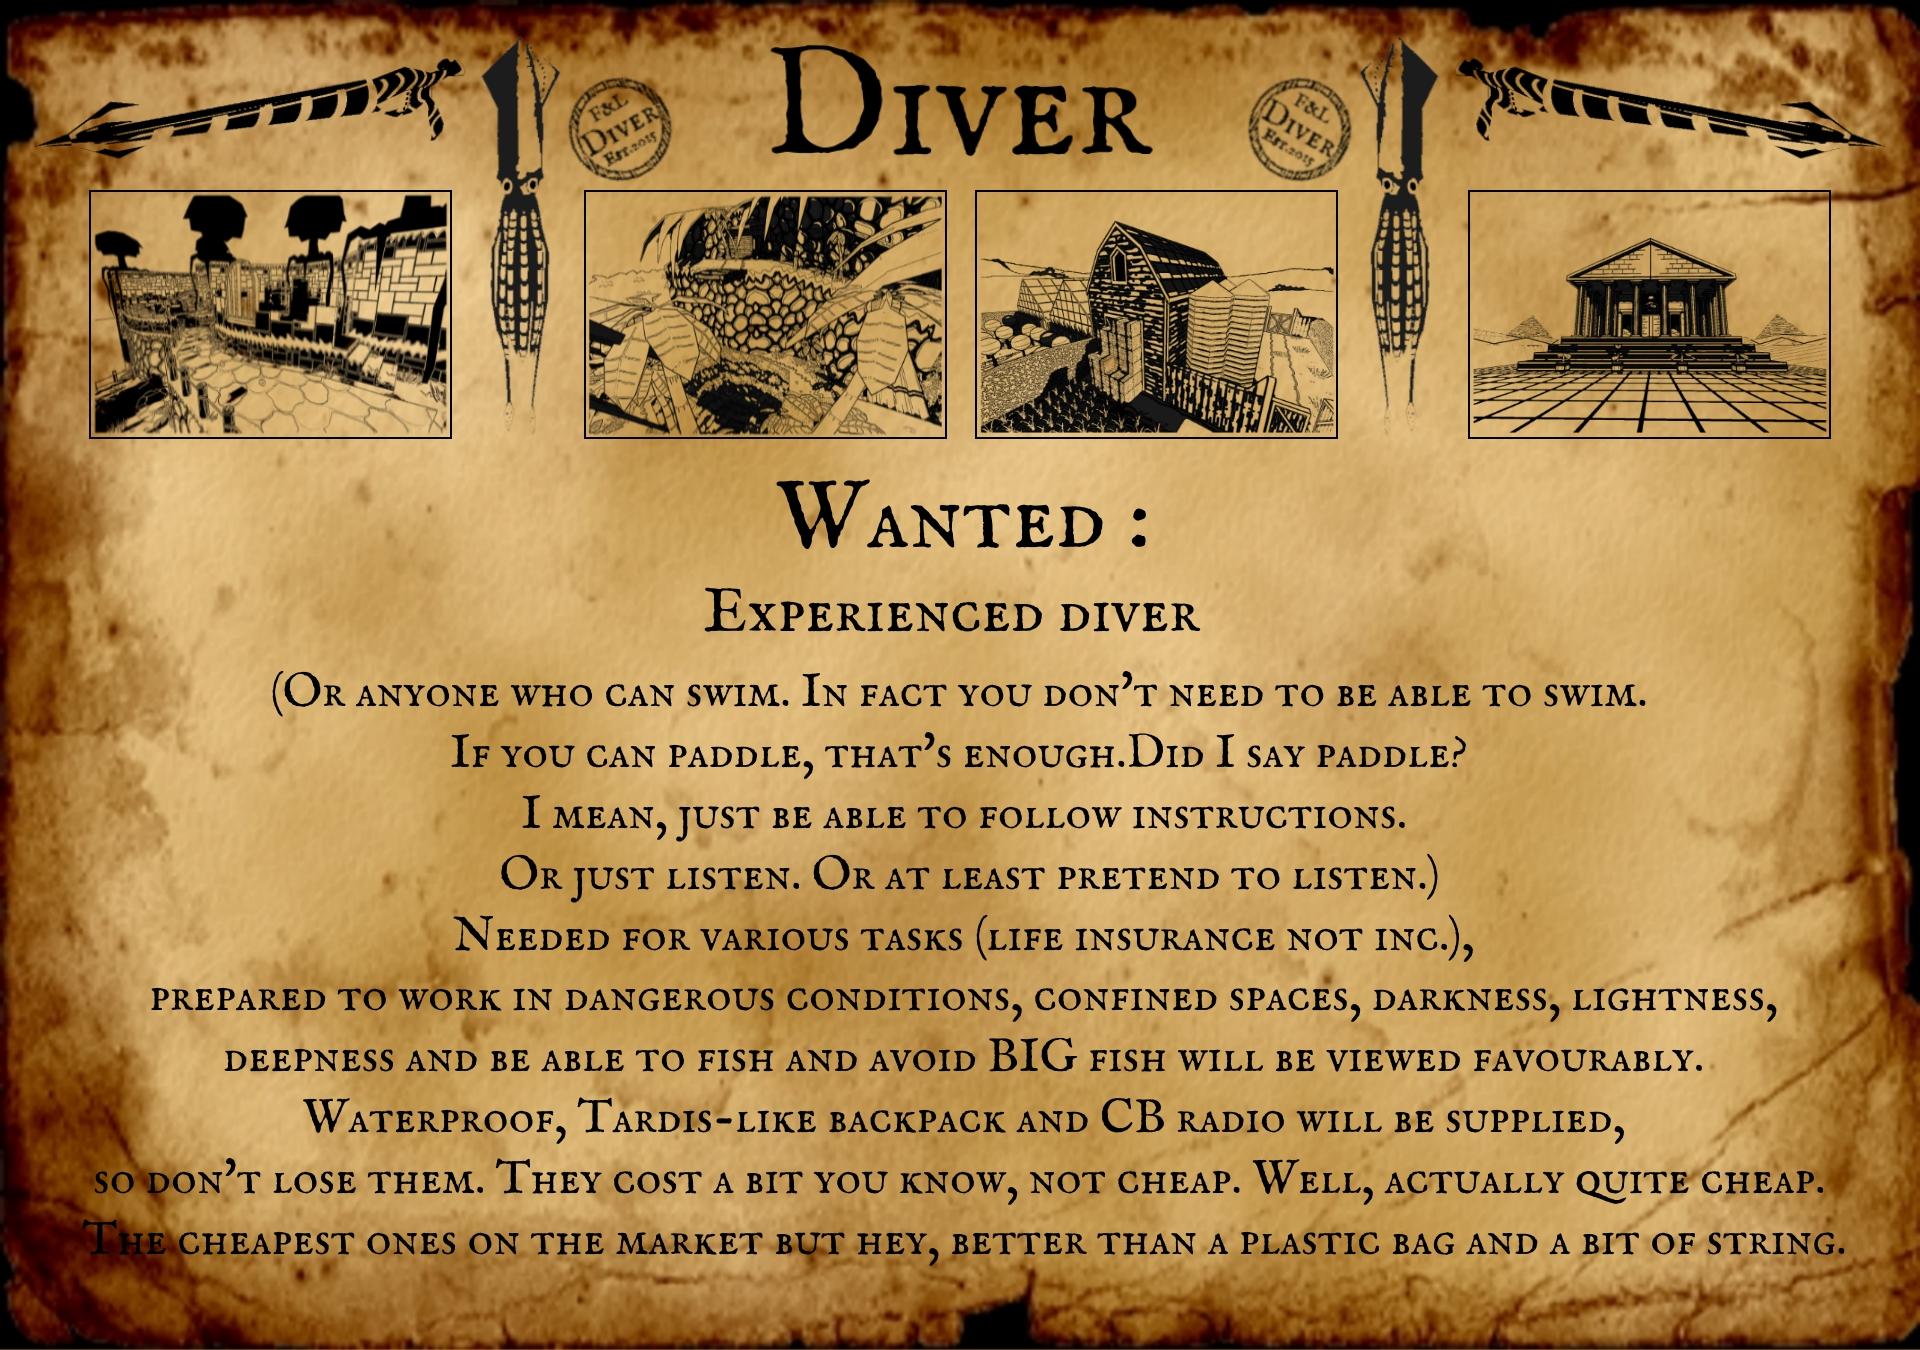 Diver details IndieDB